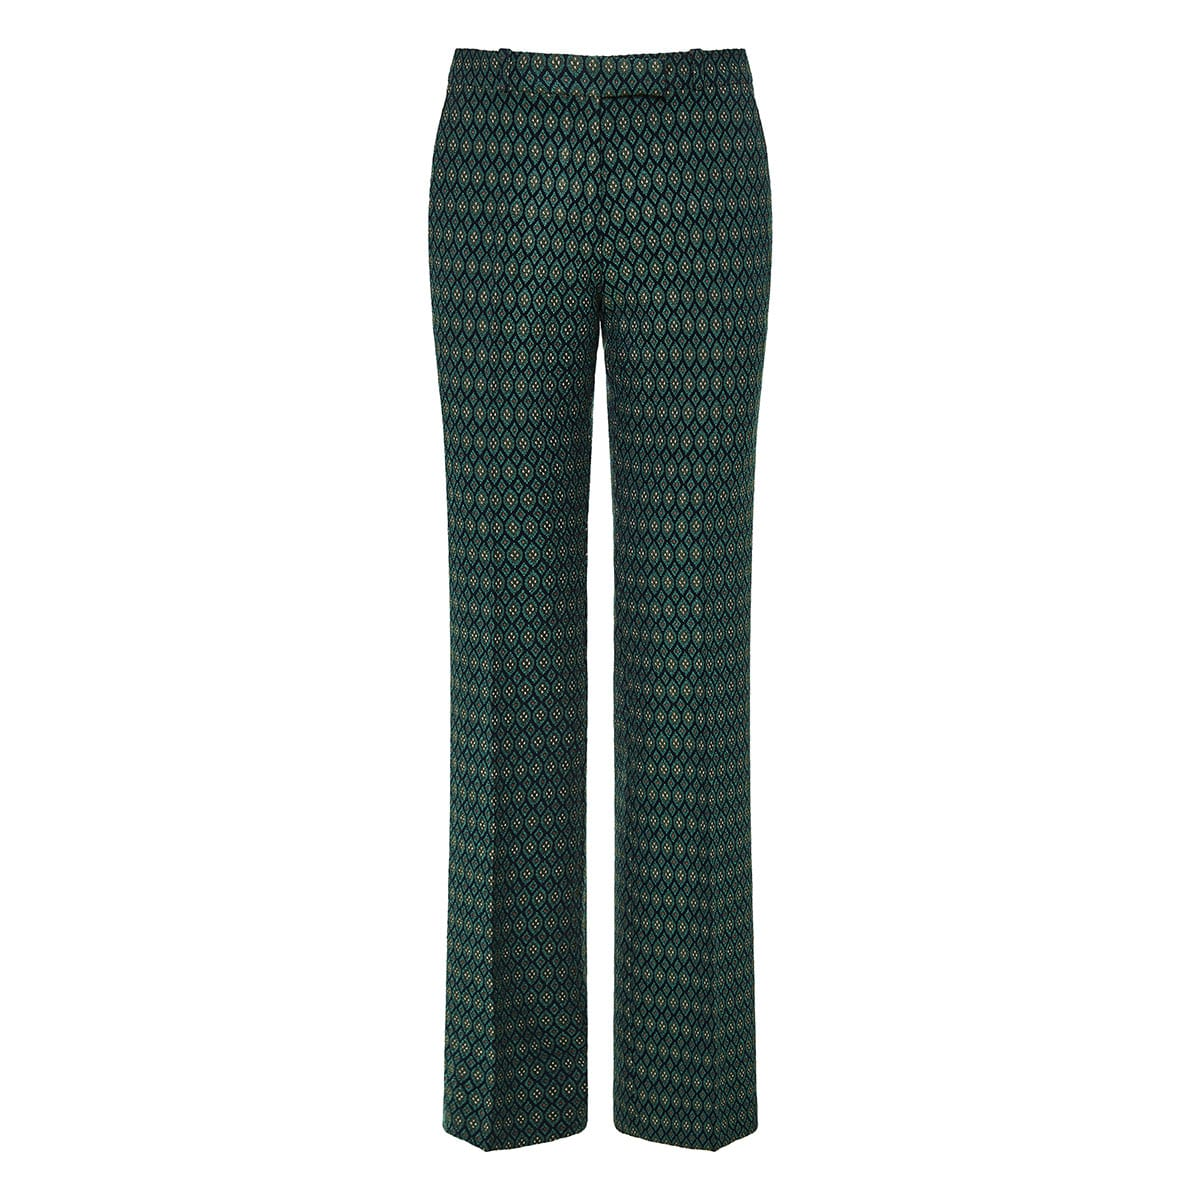 Geometric patterned jacquard trousers